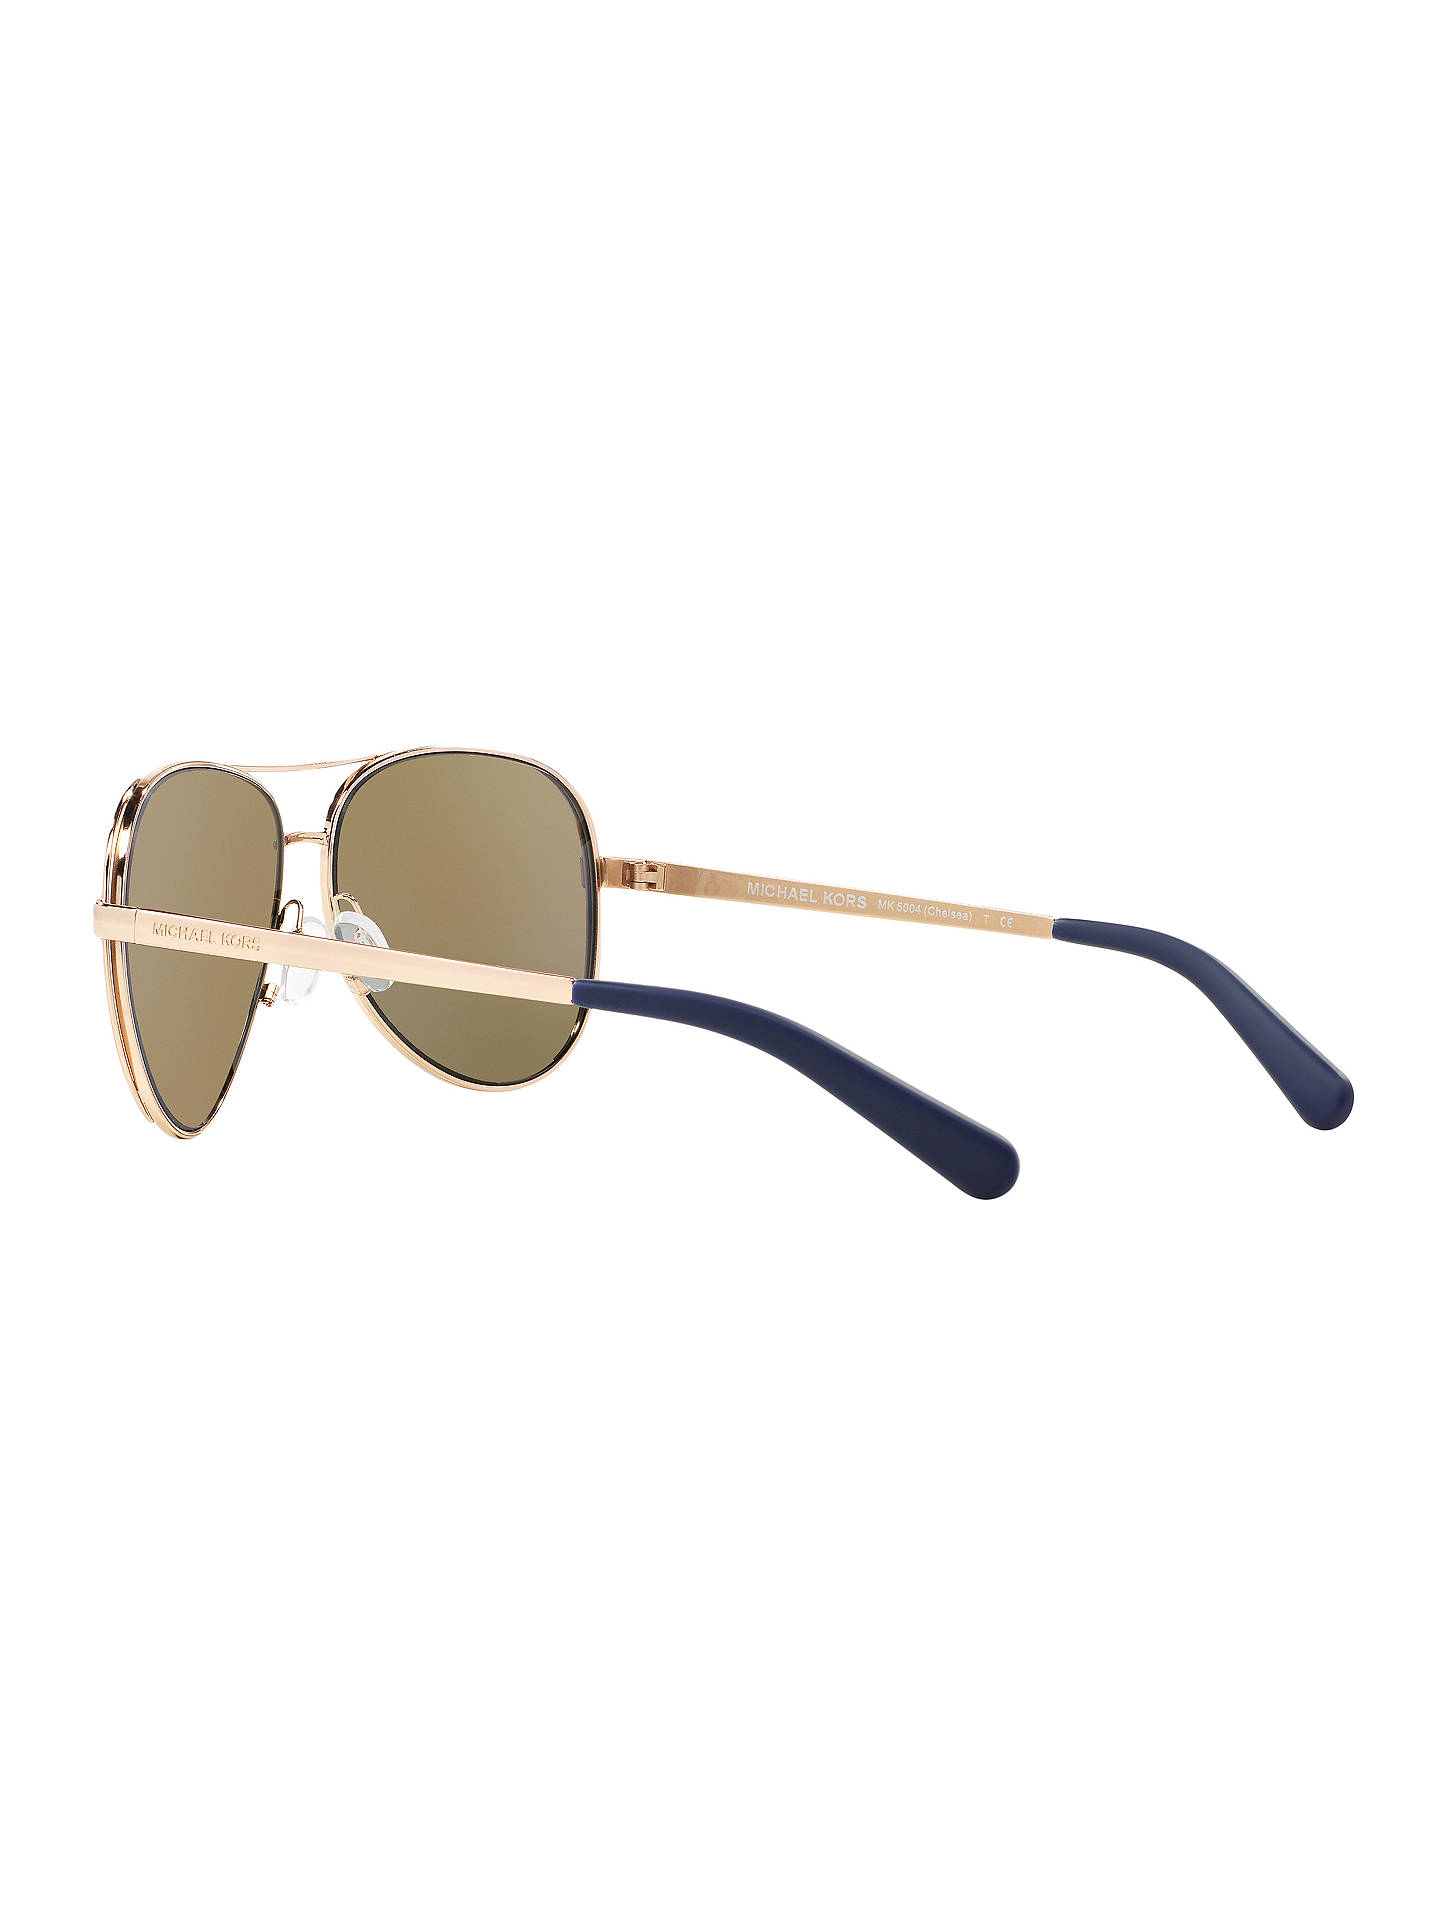 58af8866e5 Michael Kors MK5004 Chelsea Polarised Aviator Sunglasses at John ...